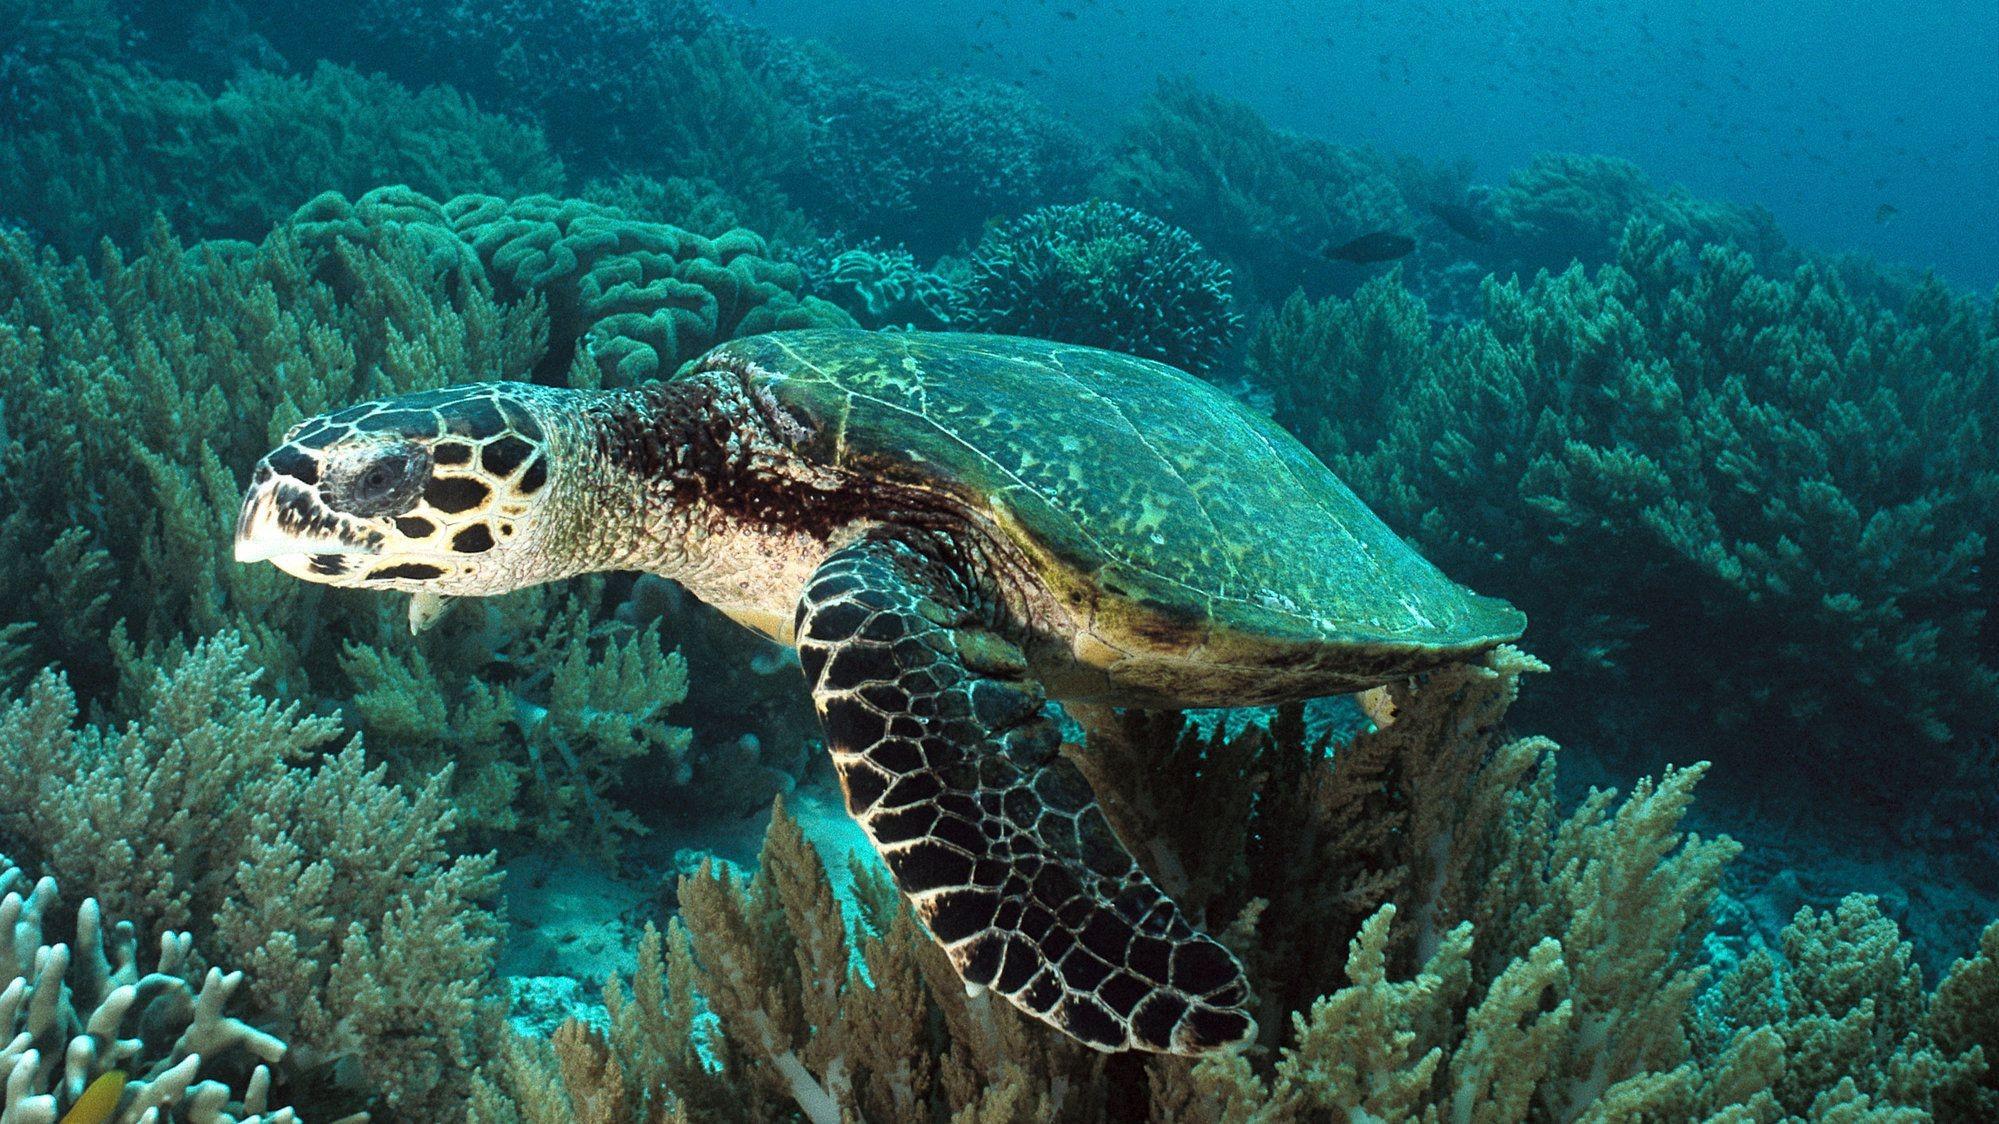 Sea Turtle Background image